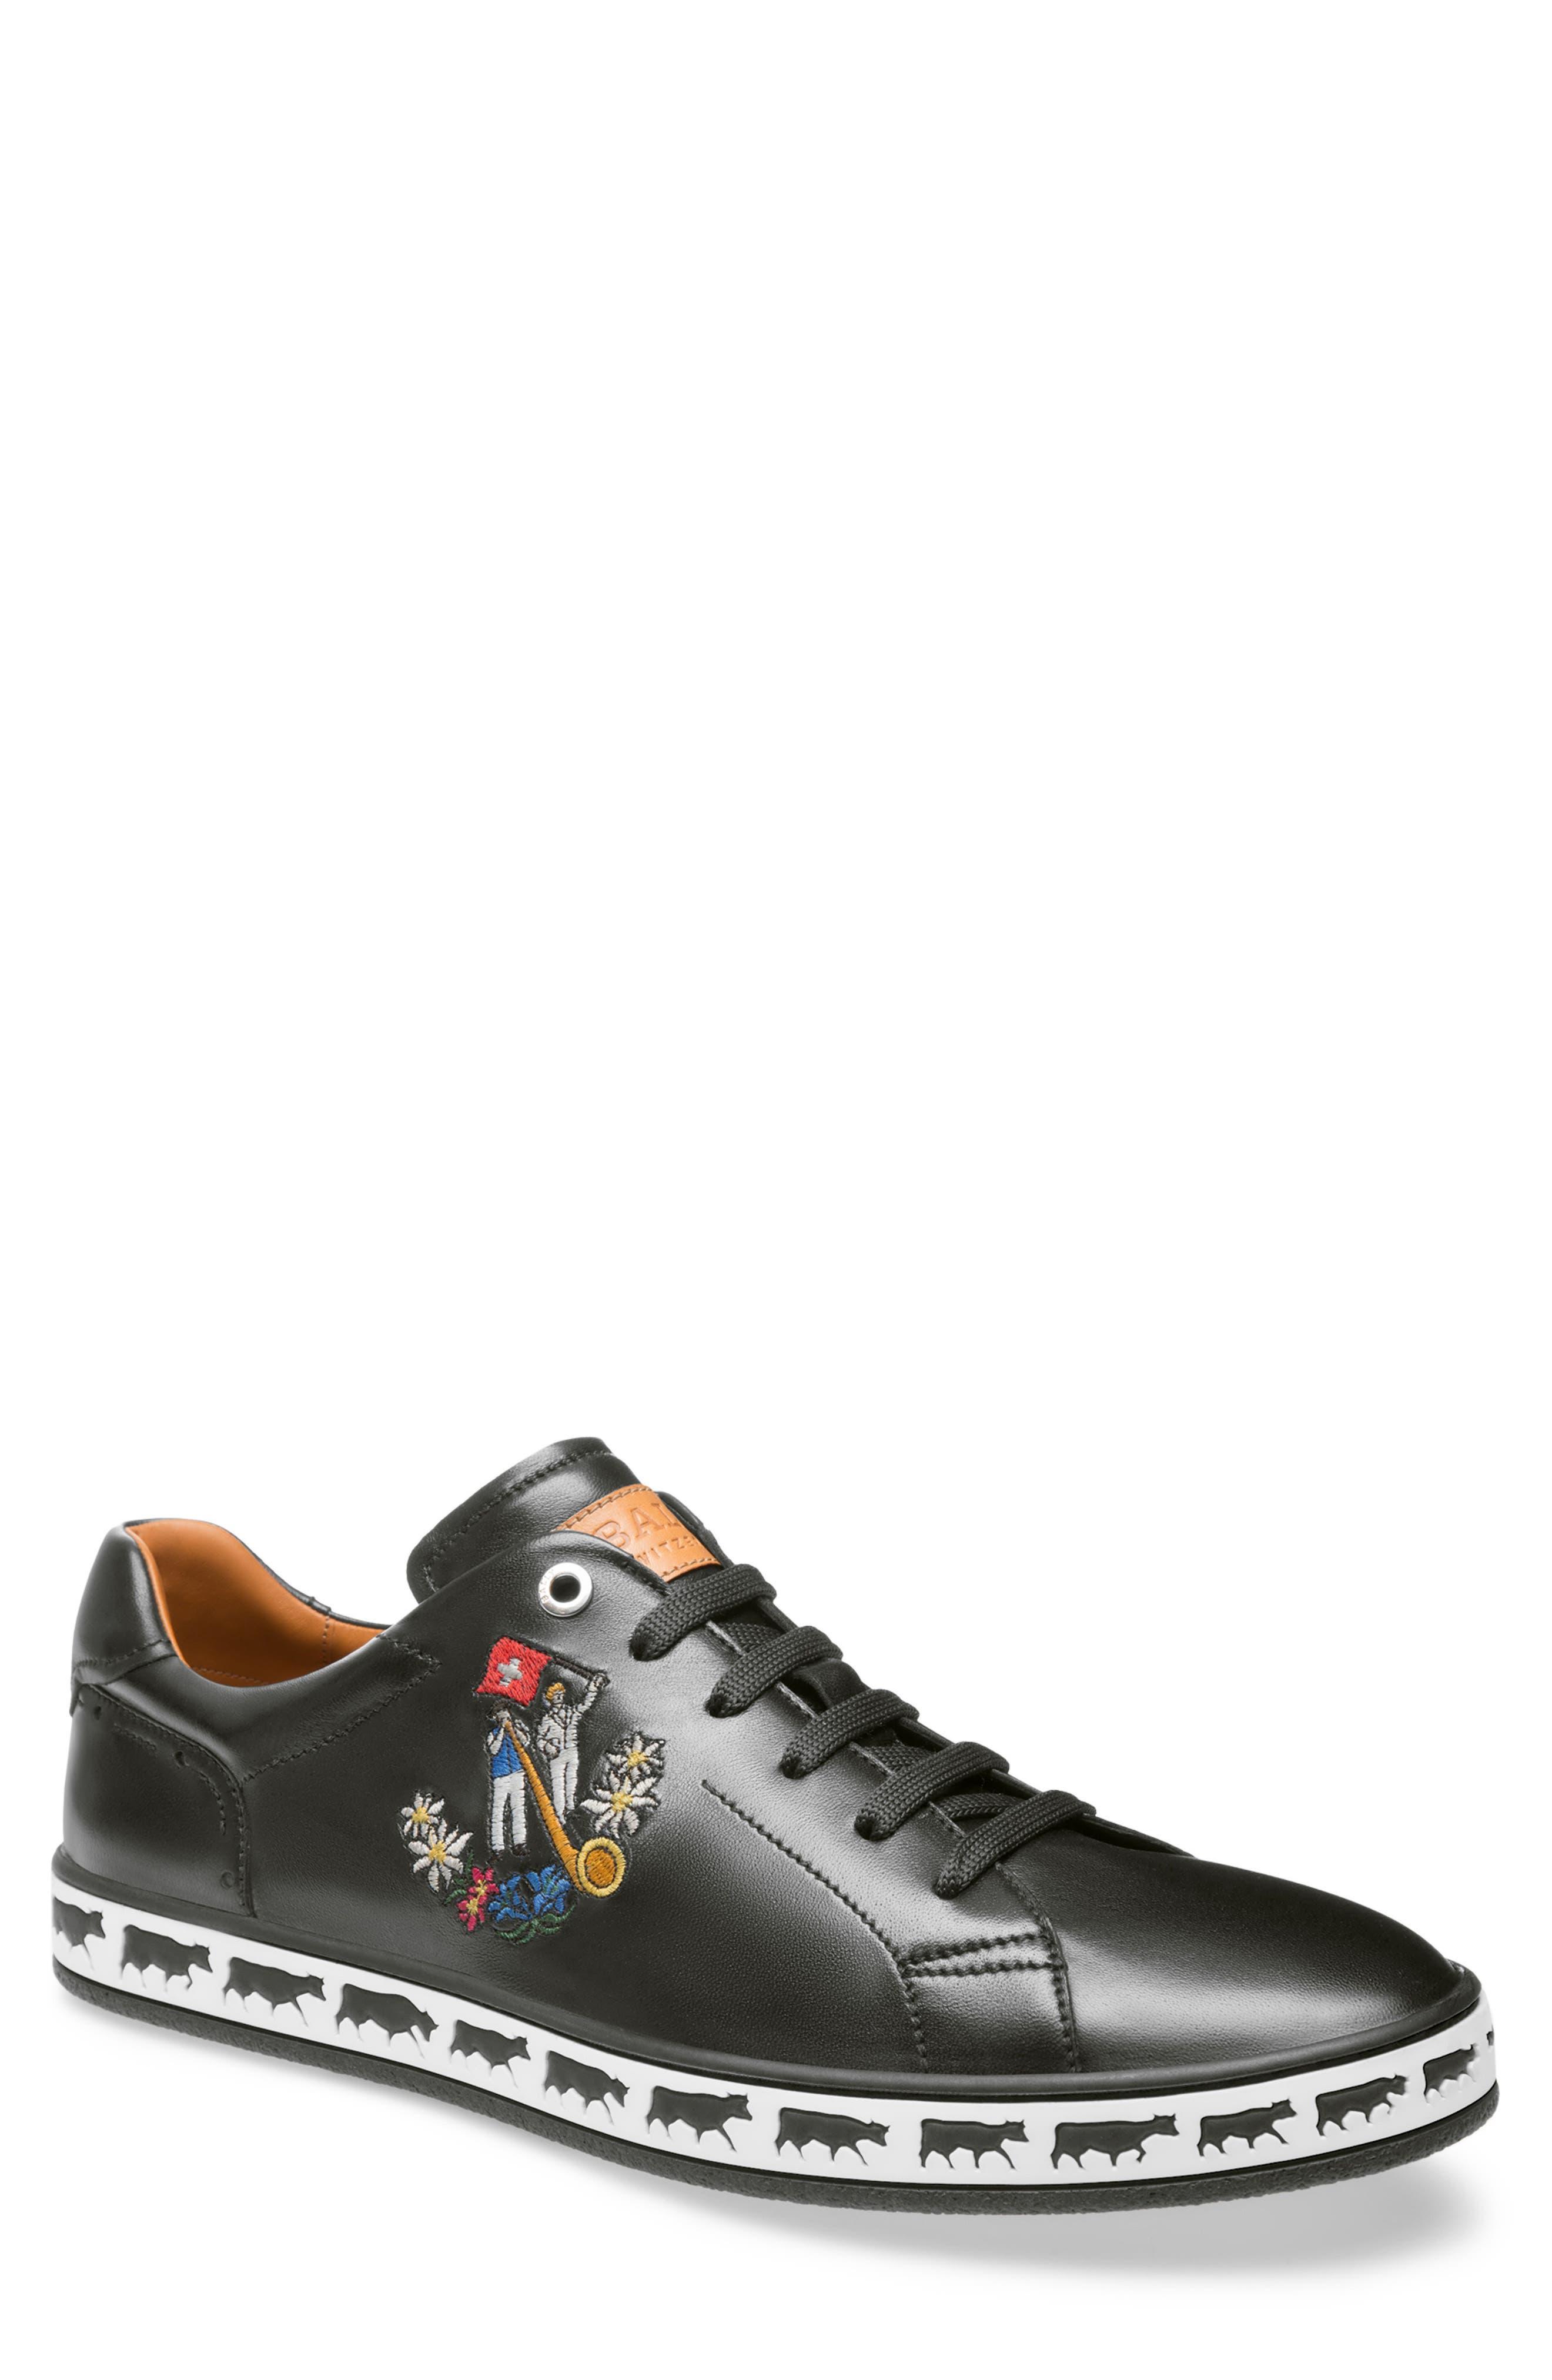 Anistern Sneaker,                         Main,                         color, BLACK